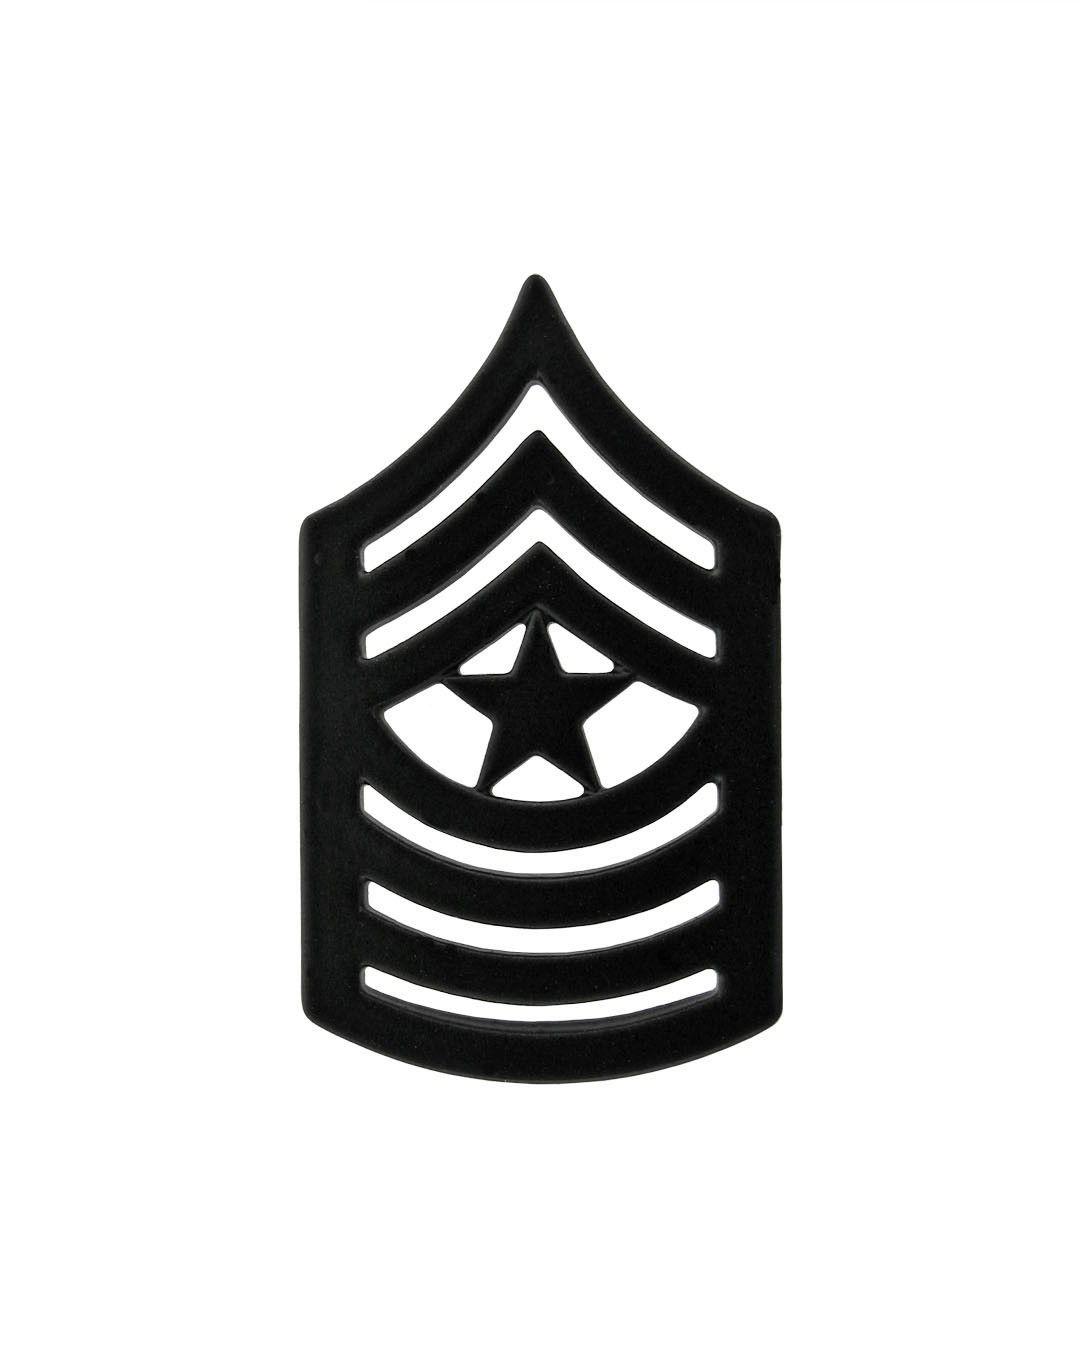 d407d12a883 Sergeant Major Marine Corps Chevron Sta-Black Item  1-M2609SB